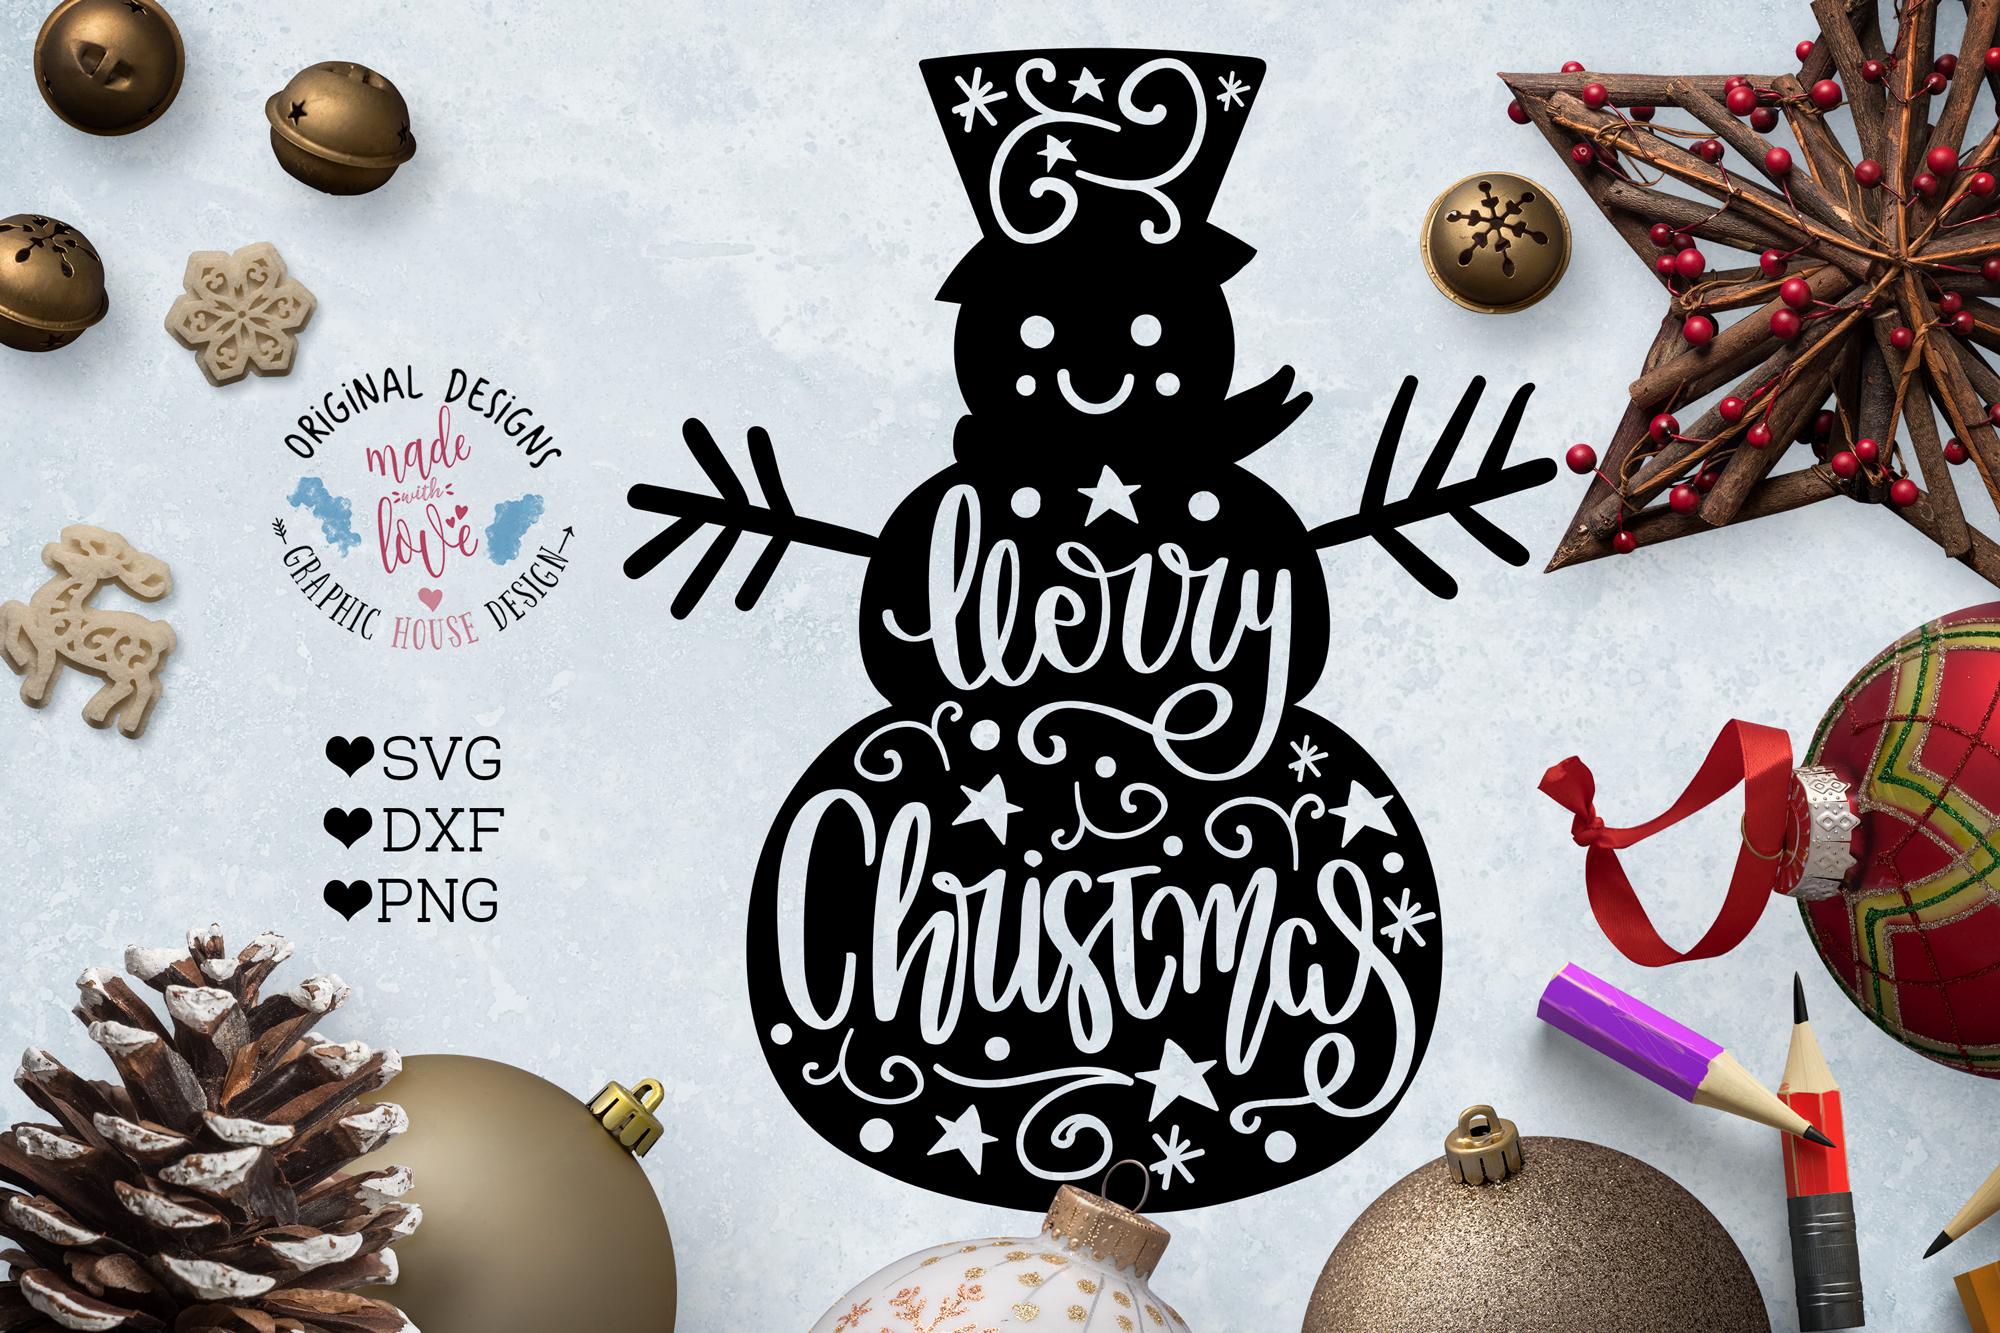 Merry Christmas Snowman - Christmas Cut File example image 1